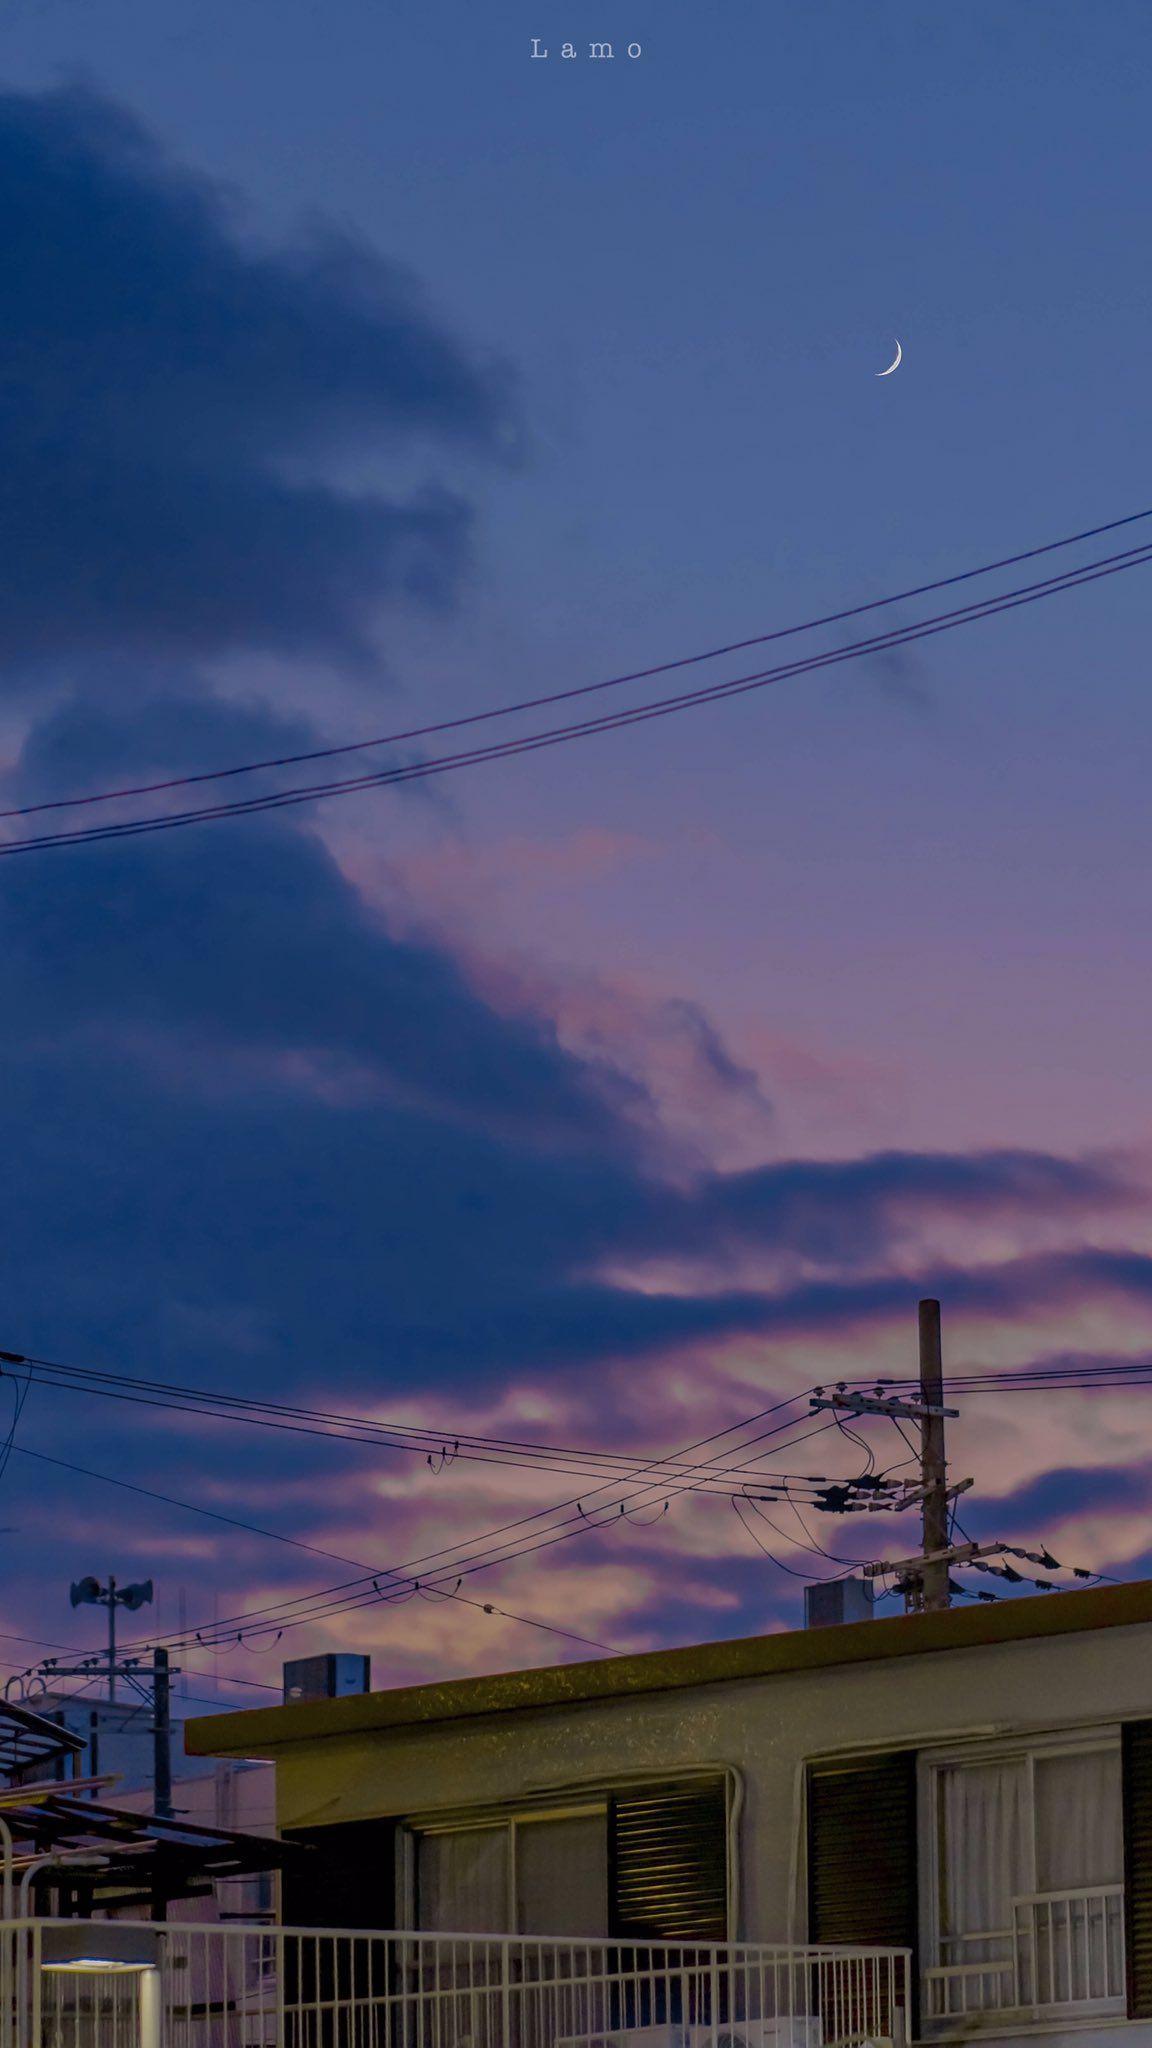 Huongkookie19 On Twitter Sky Aesthetic Scenery Wallpaper Aesthetic Pastel Wallpaper